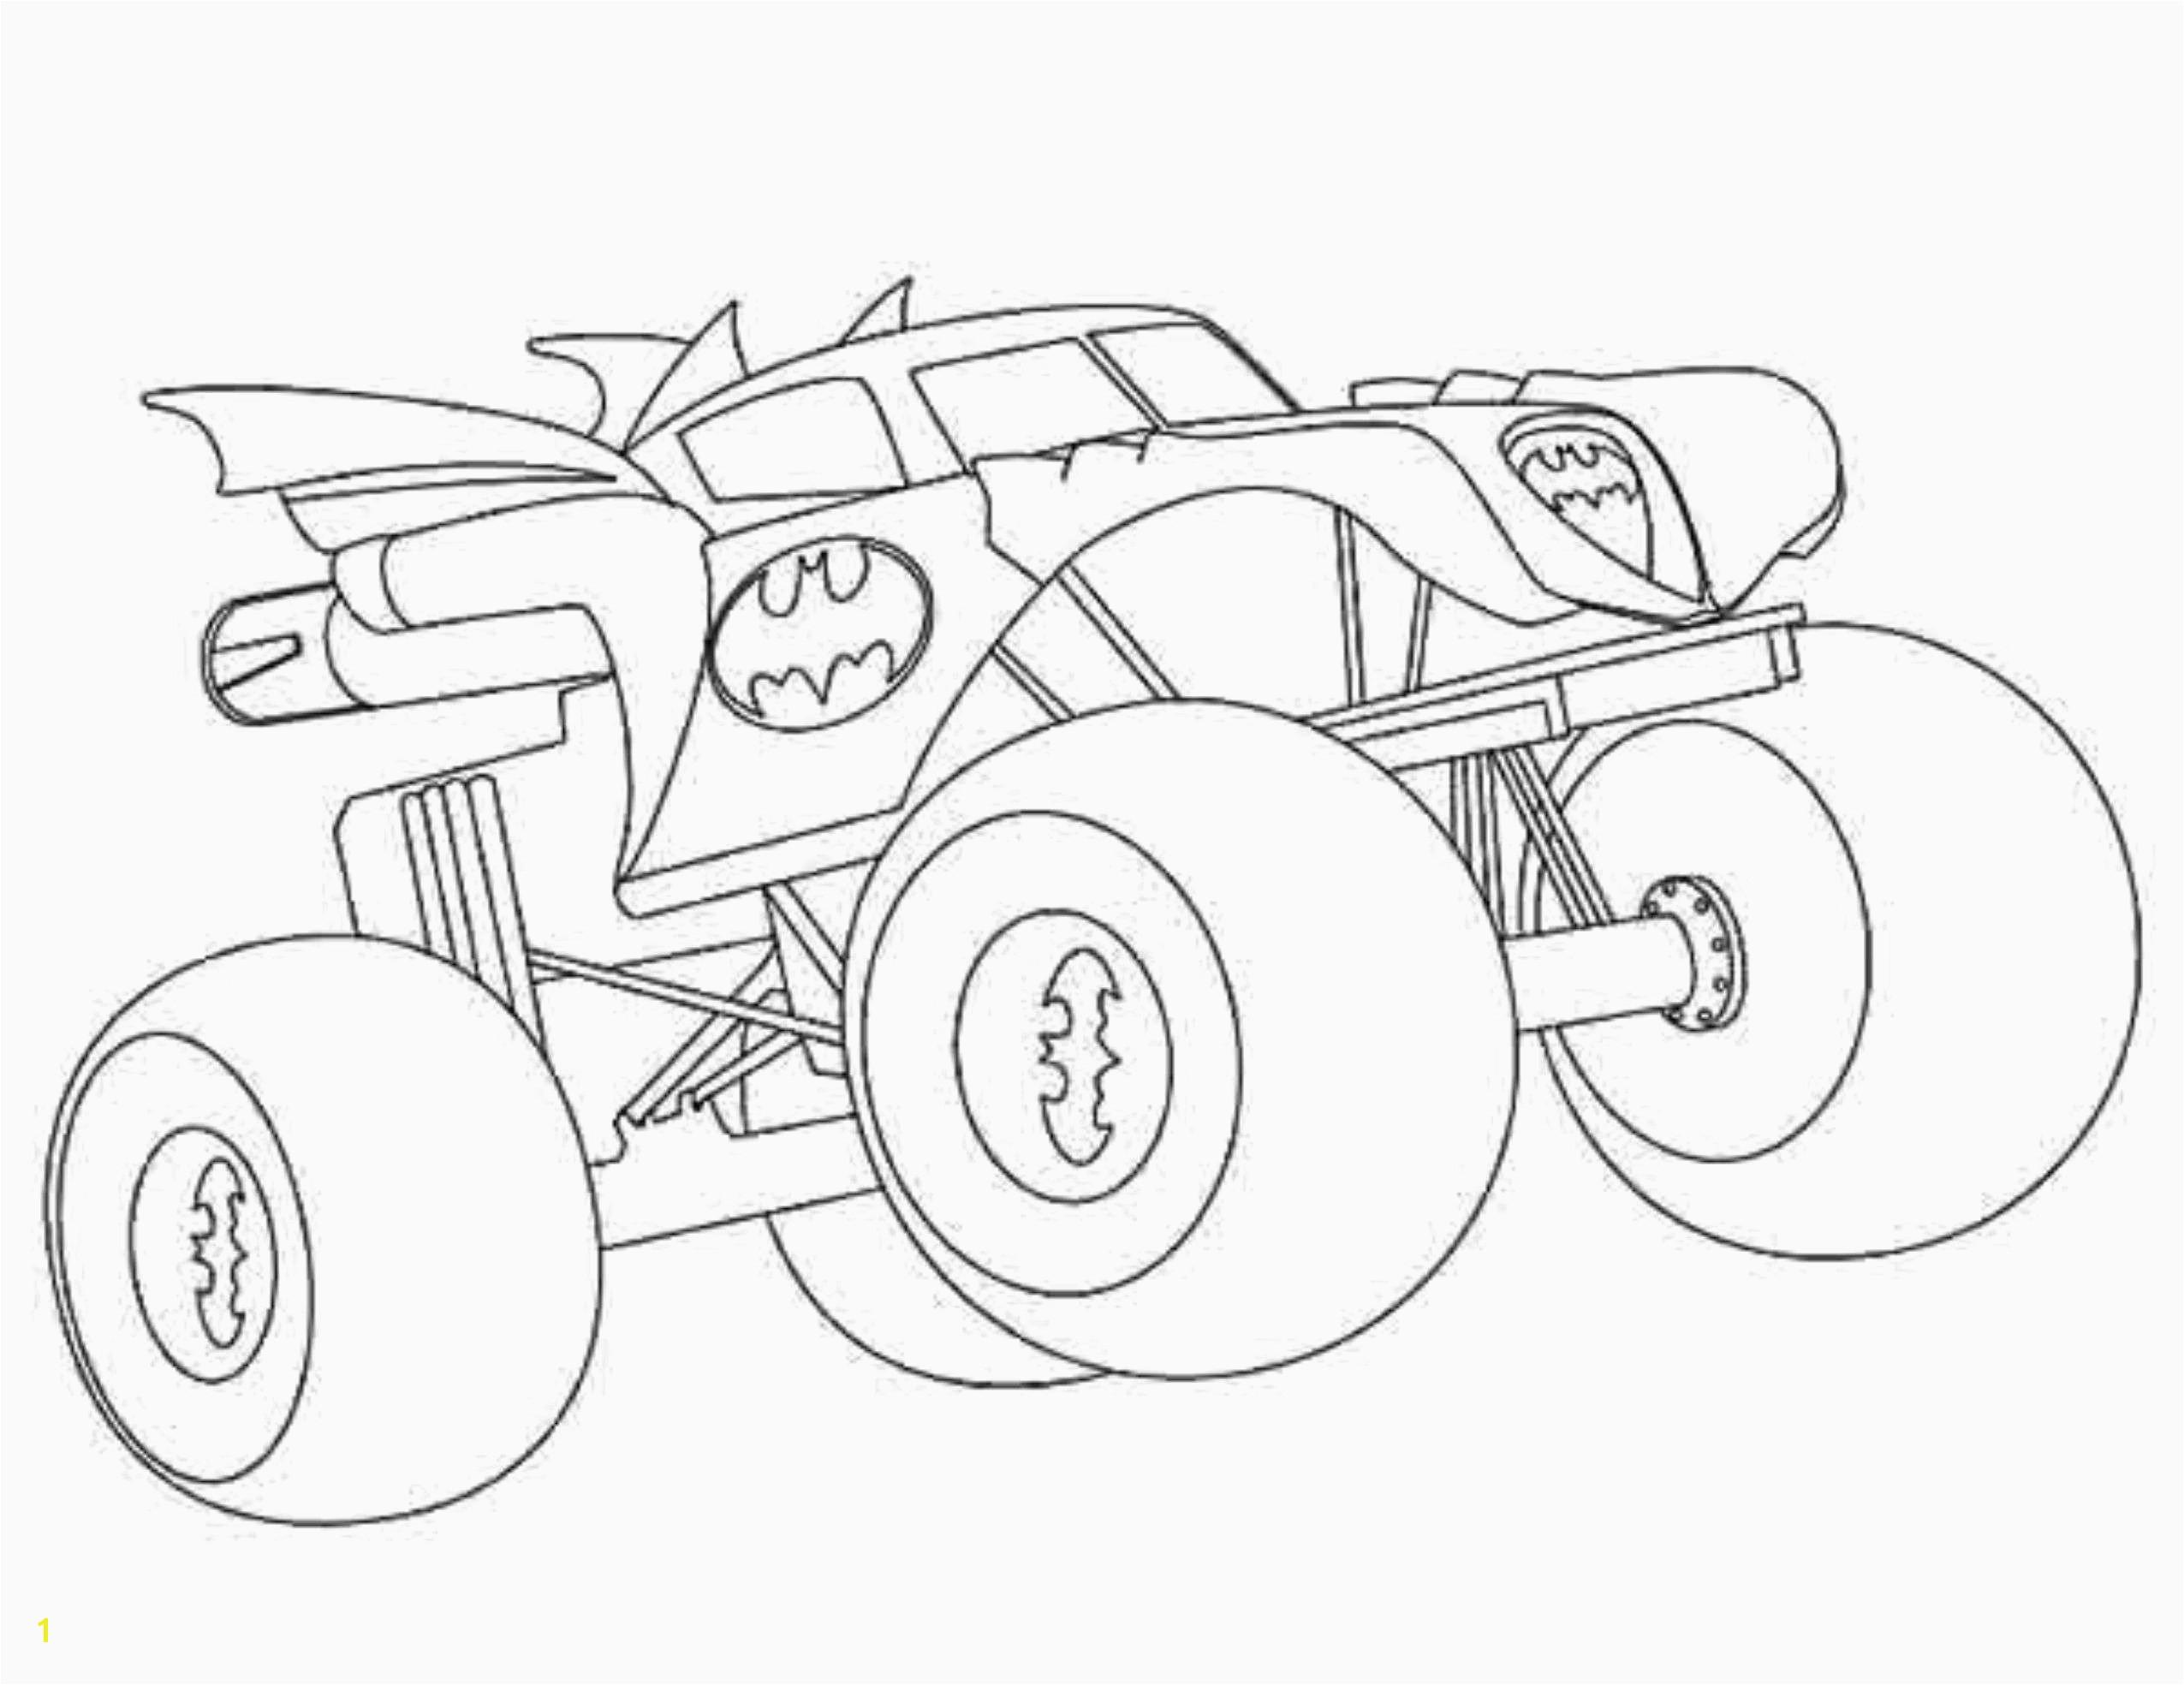 Printable Coloring Sheets Monster Trucks Batman Monster Truck Coloring Pages Coloring Chrsistmas